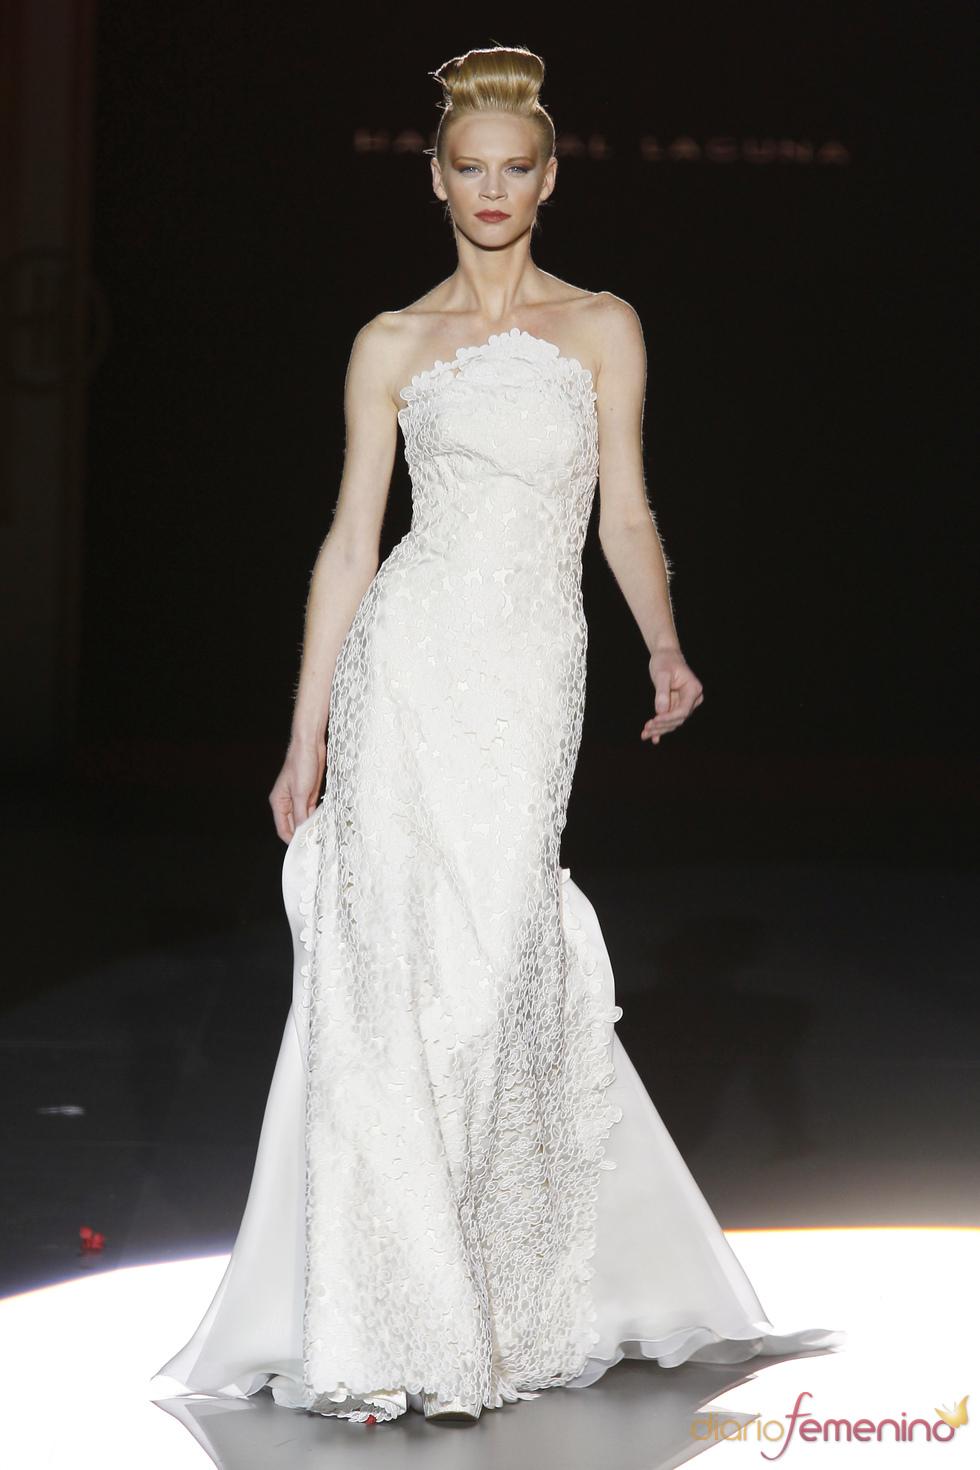 Hannibal Laguna viste a la novia de 2011